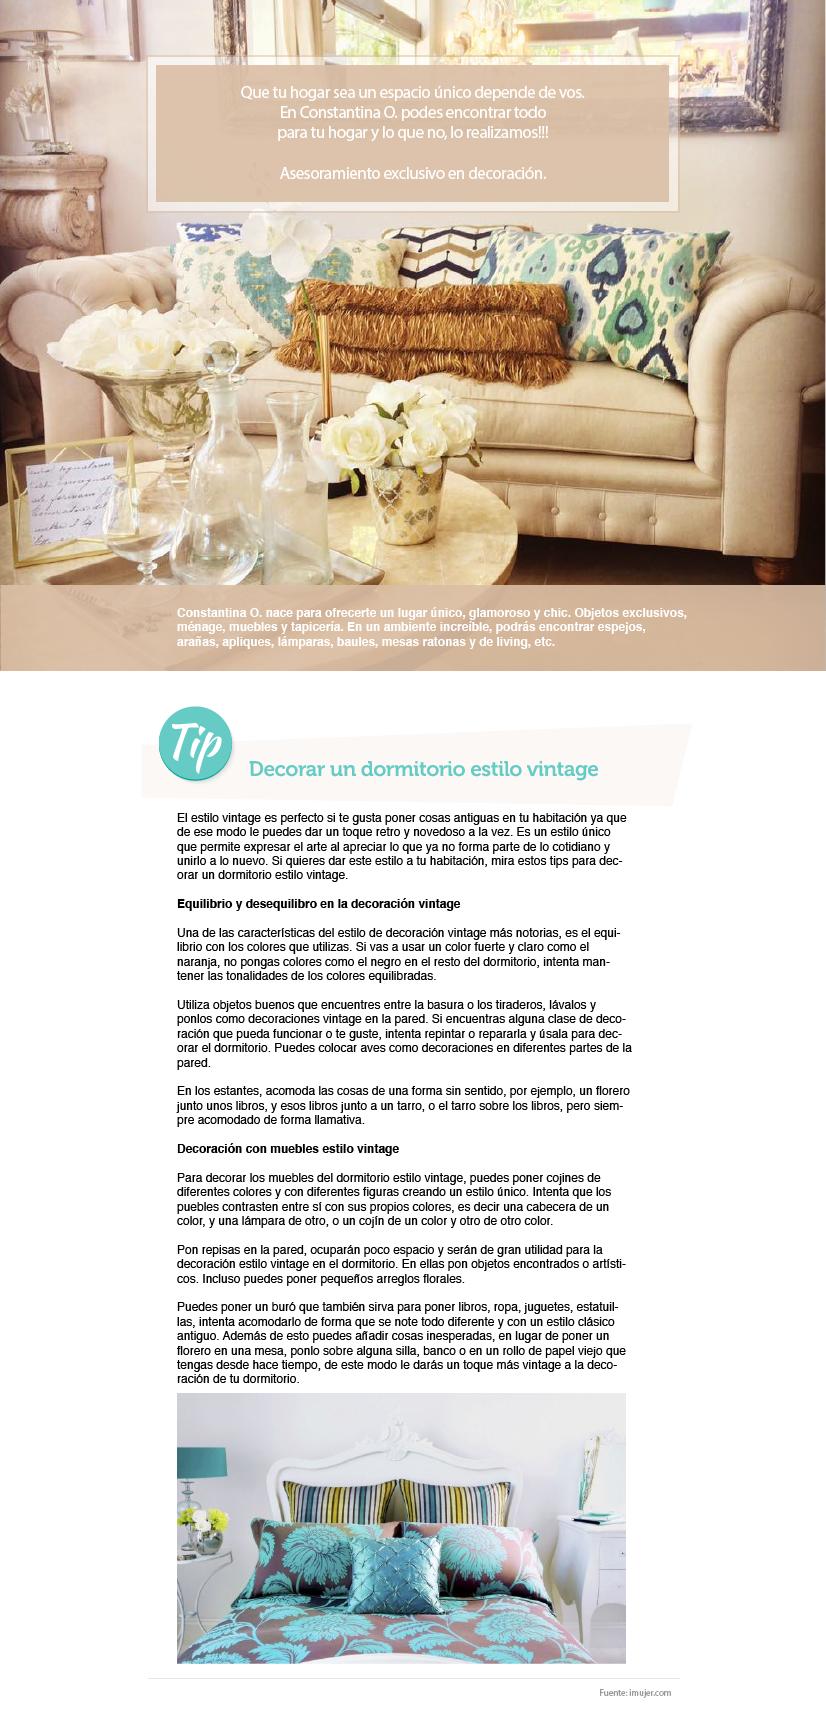 Constantina O Maison Infomarcas # Muebles Figuras Y Formas